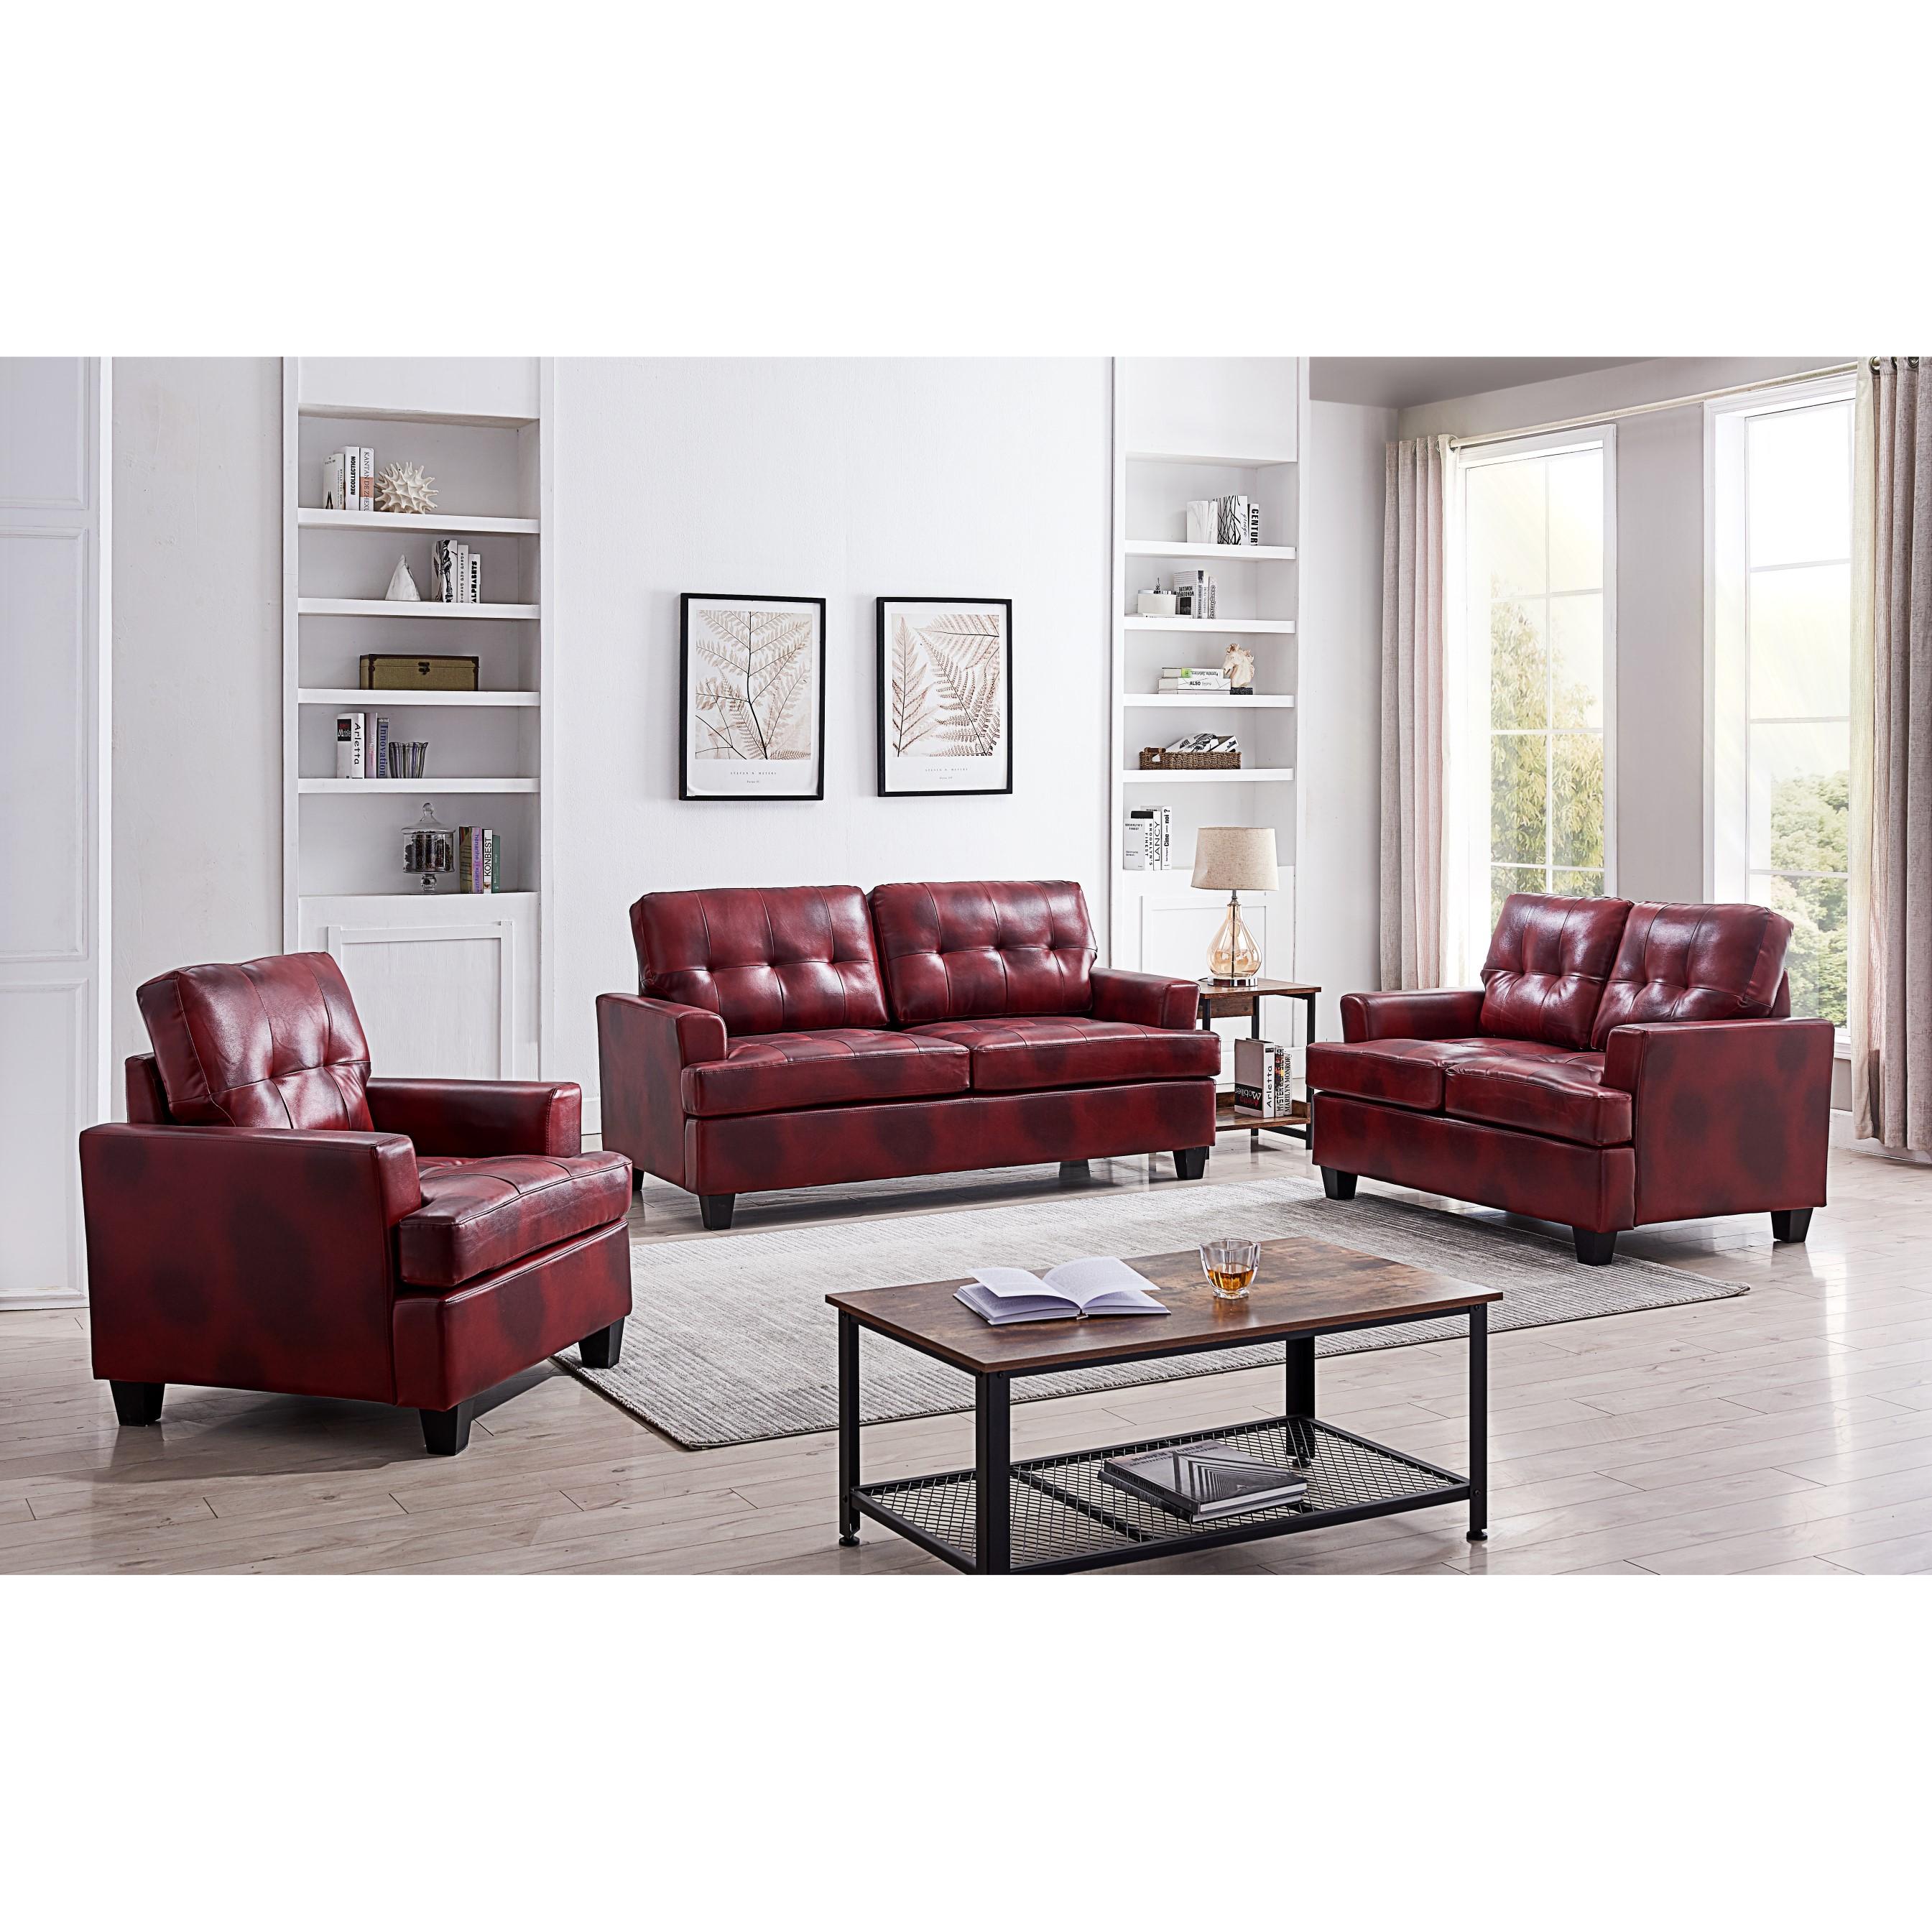 Hanson Living Room Set (Red)